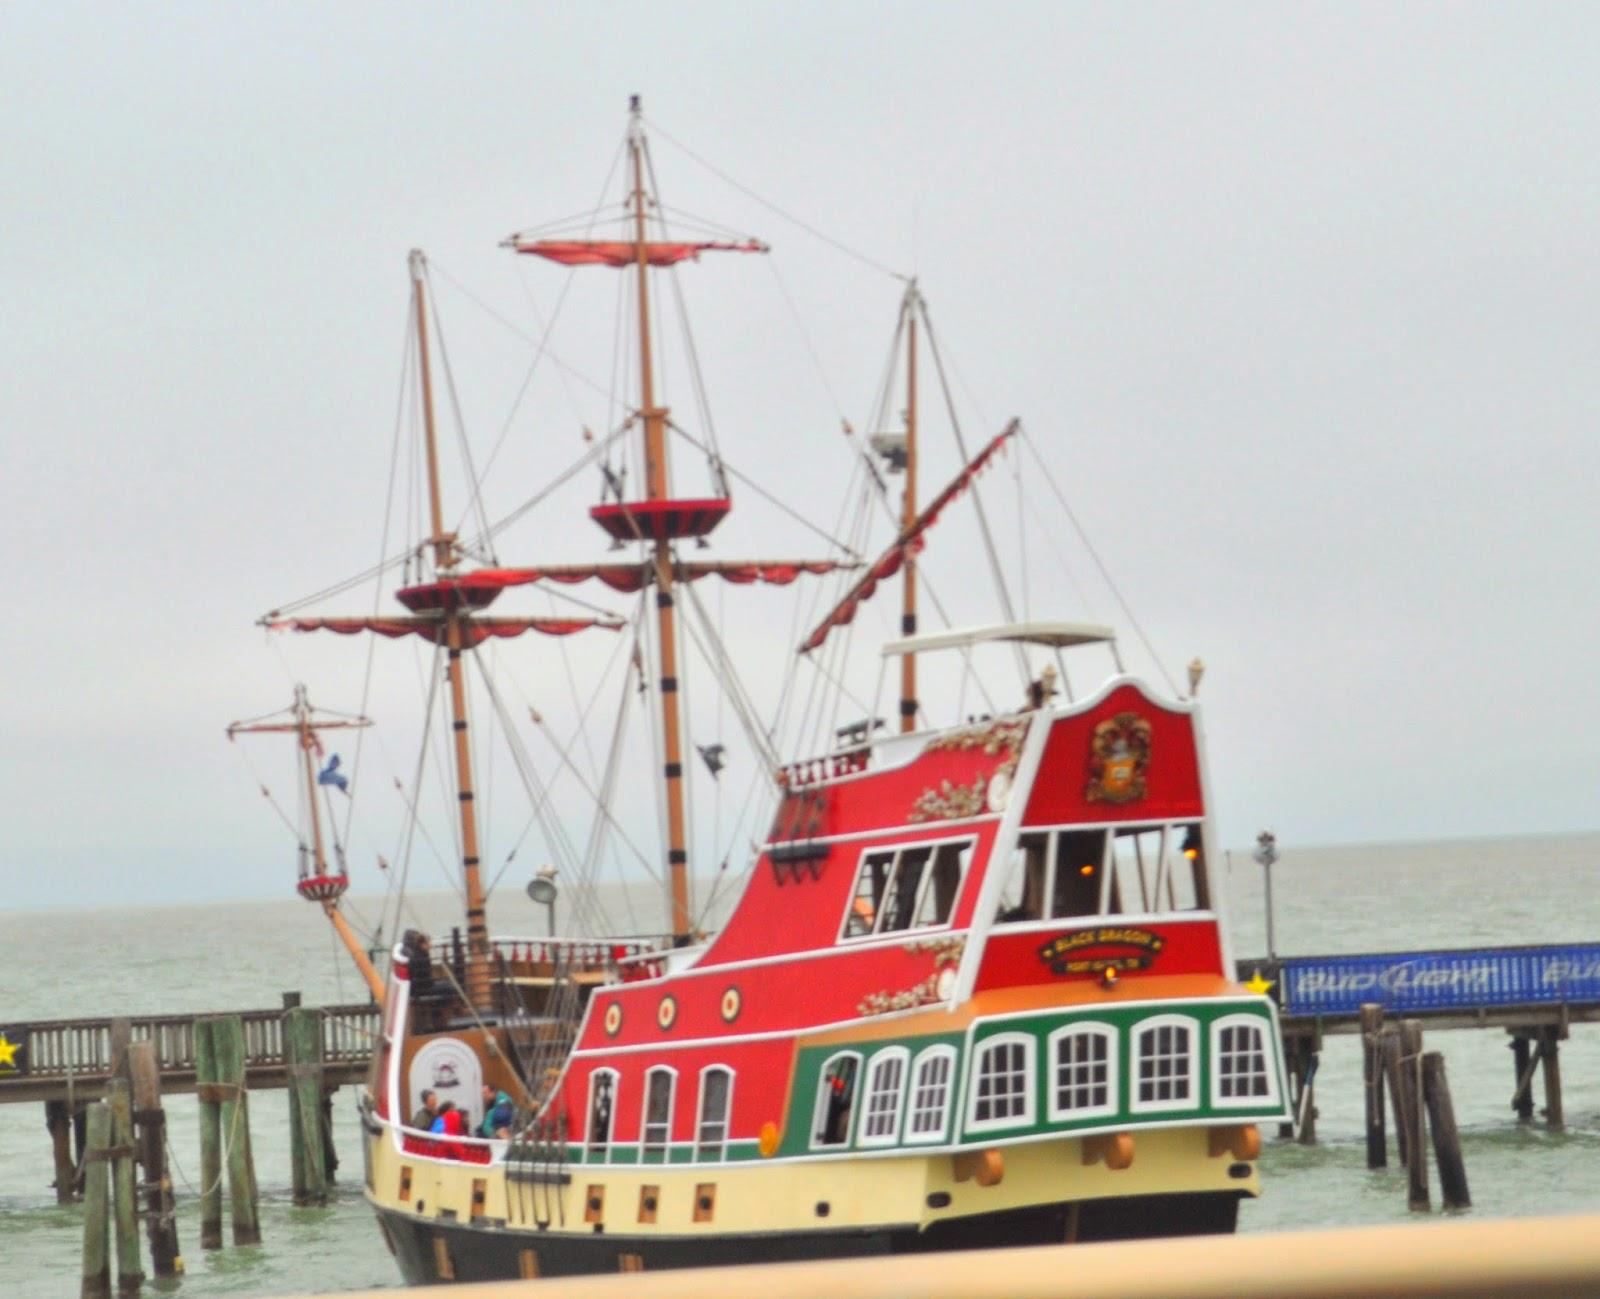 Black Dragon Pirate Ship ~ The Dias Family Adventures